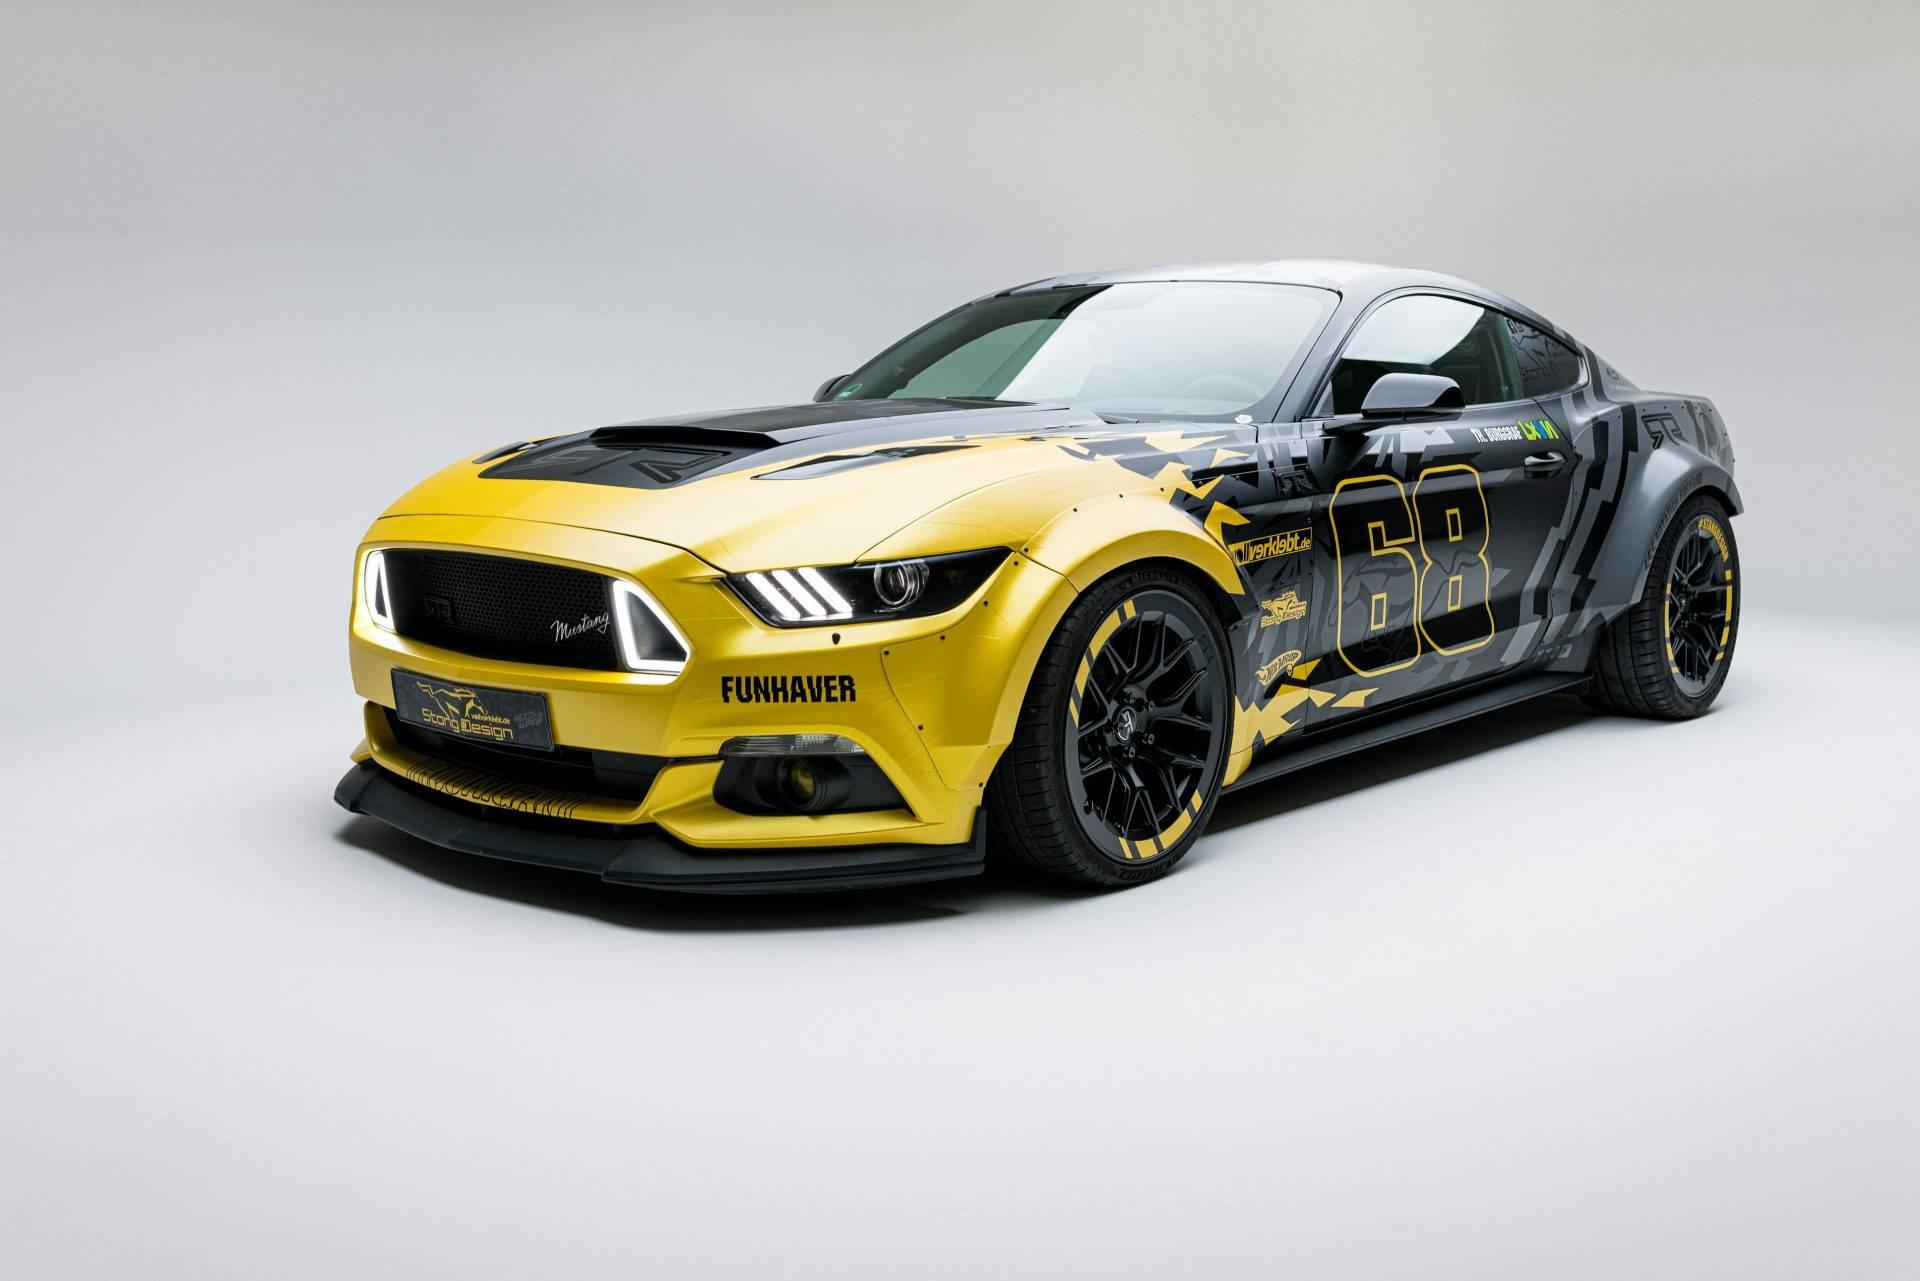 100168_Thomas_Ford_Mustang_s_6